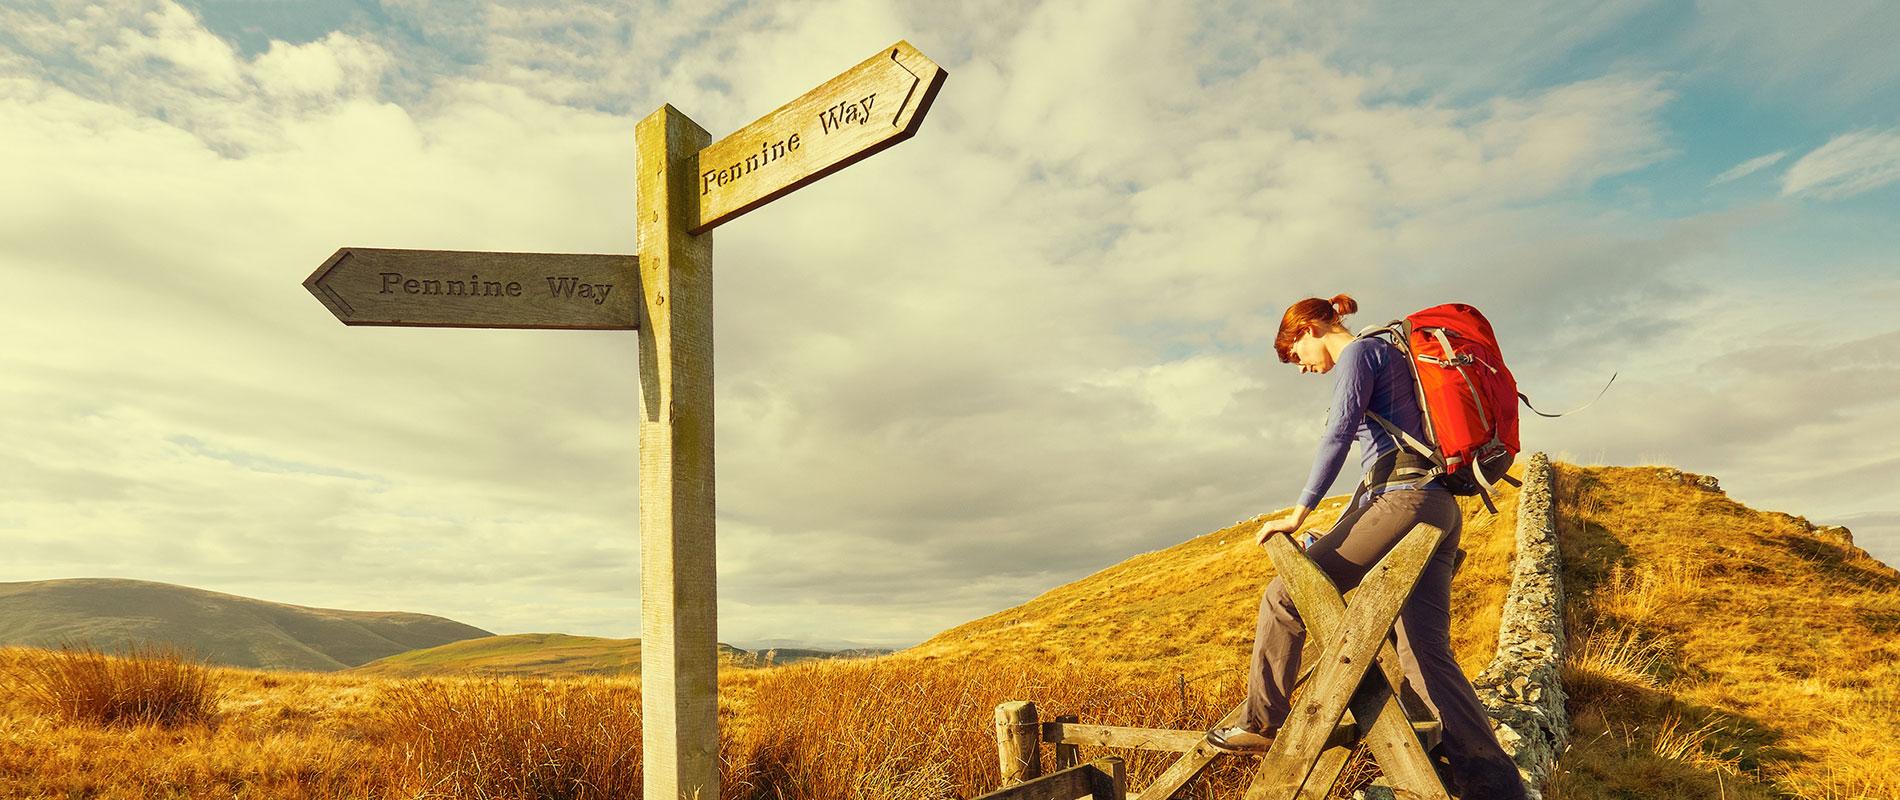 walking-the-pennine-way-banner